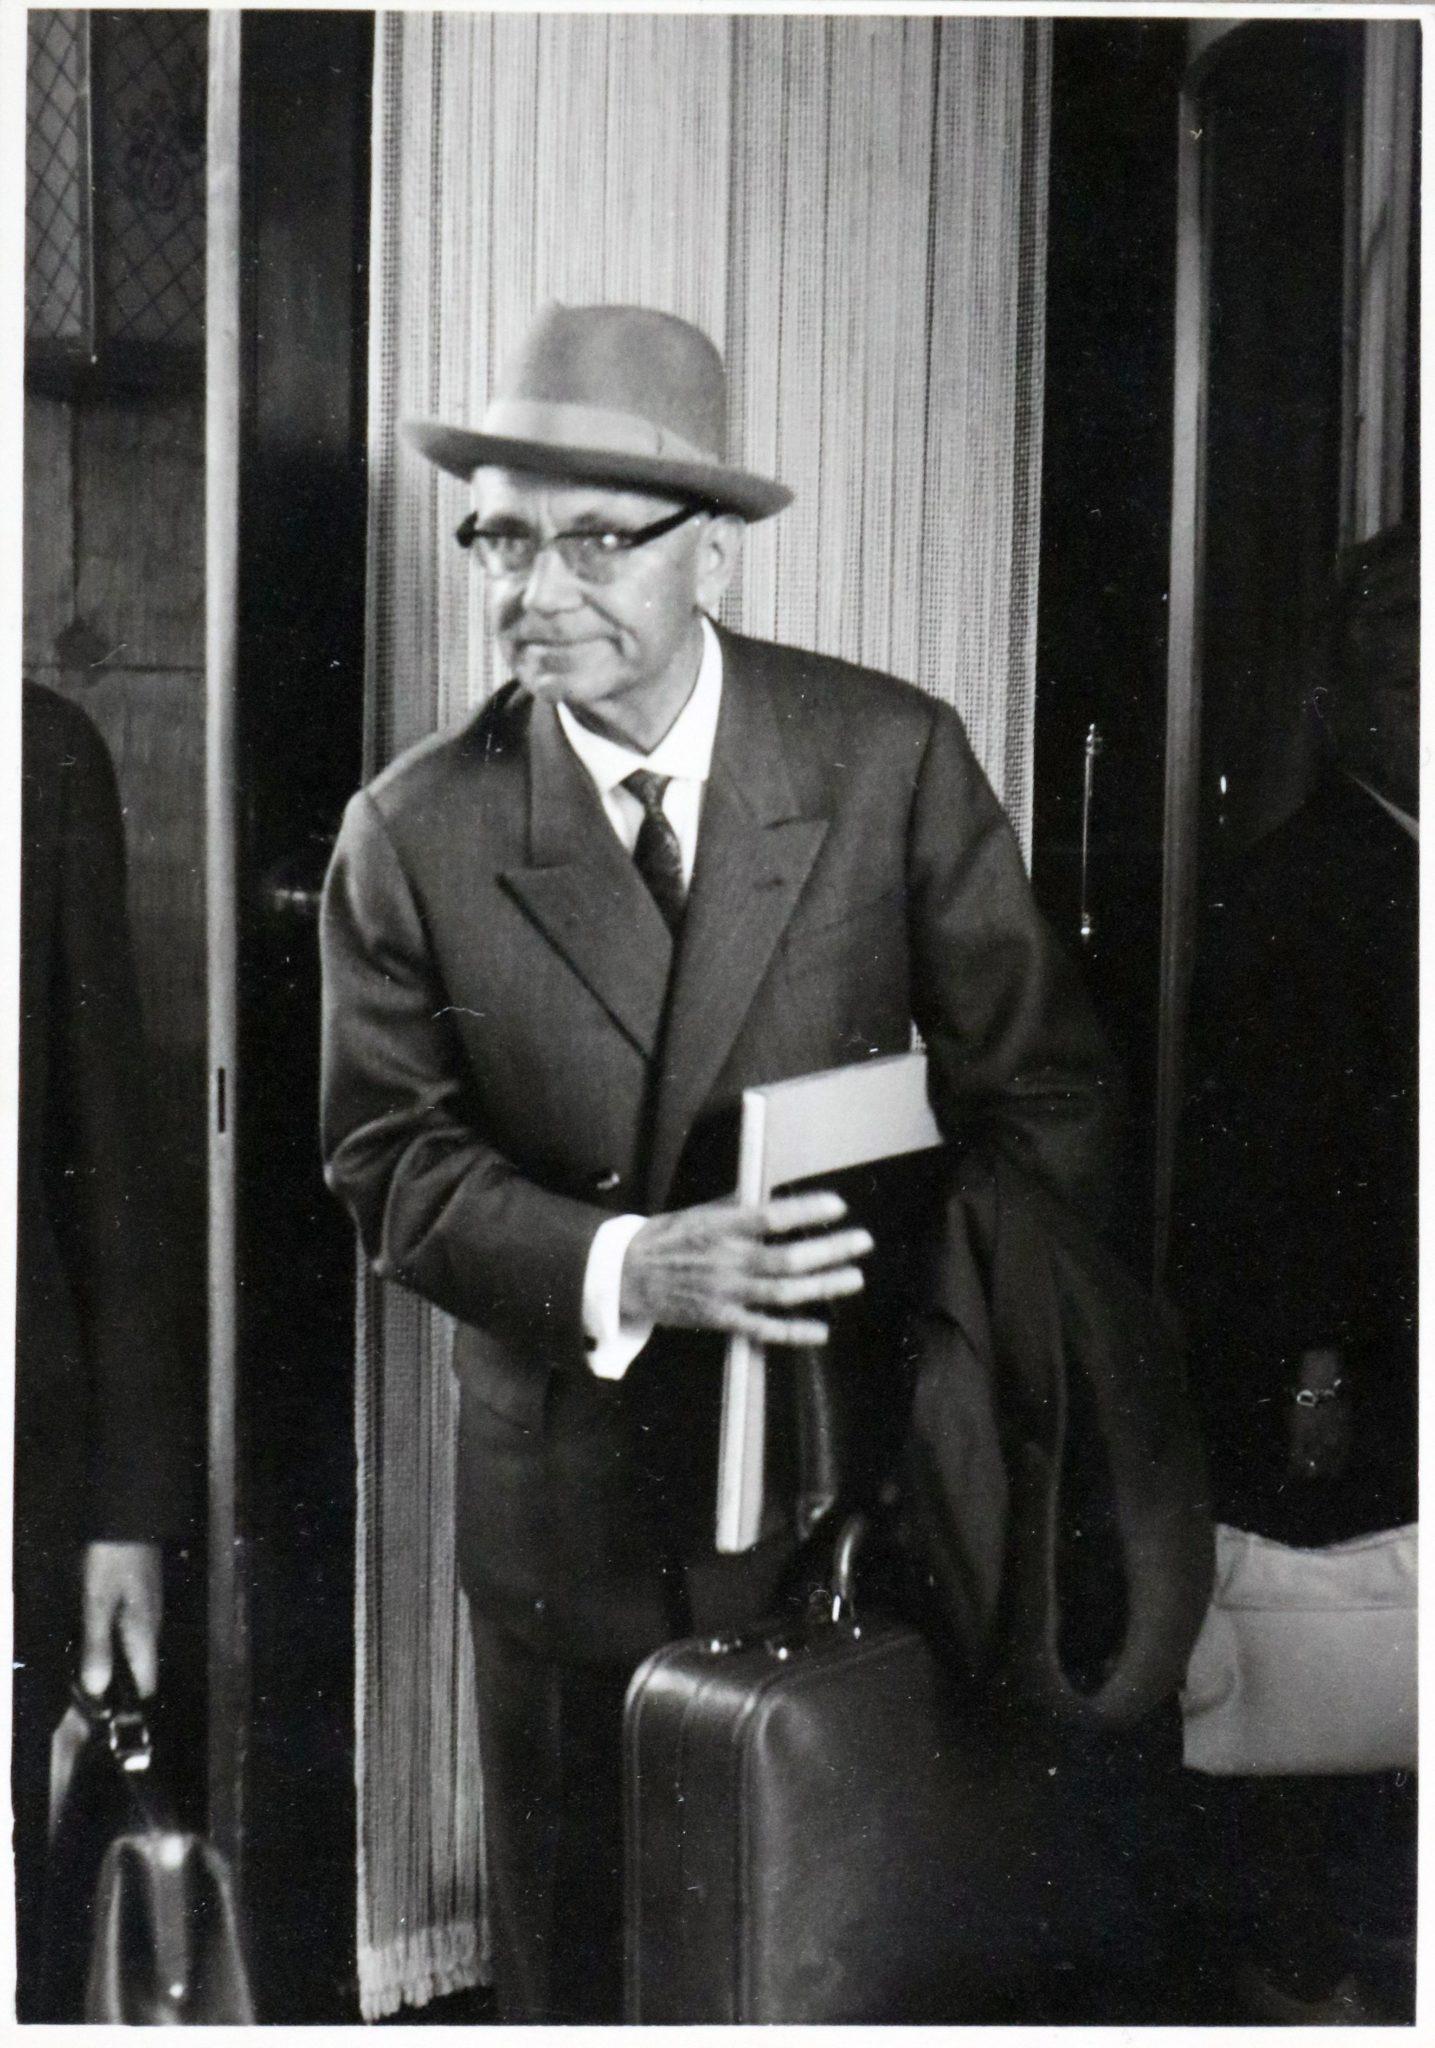 Heinrich Vögele 1968